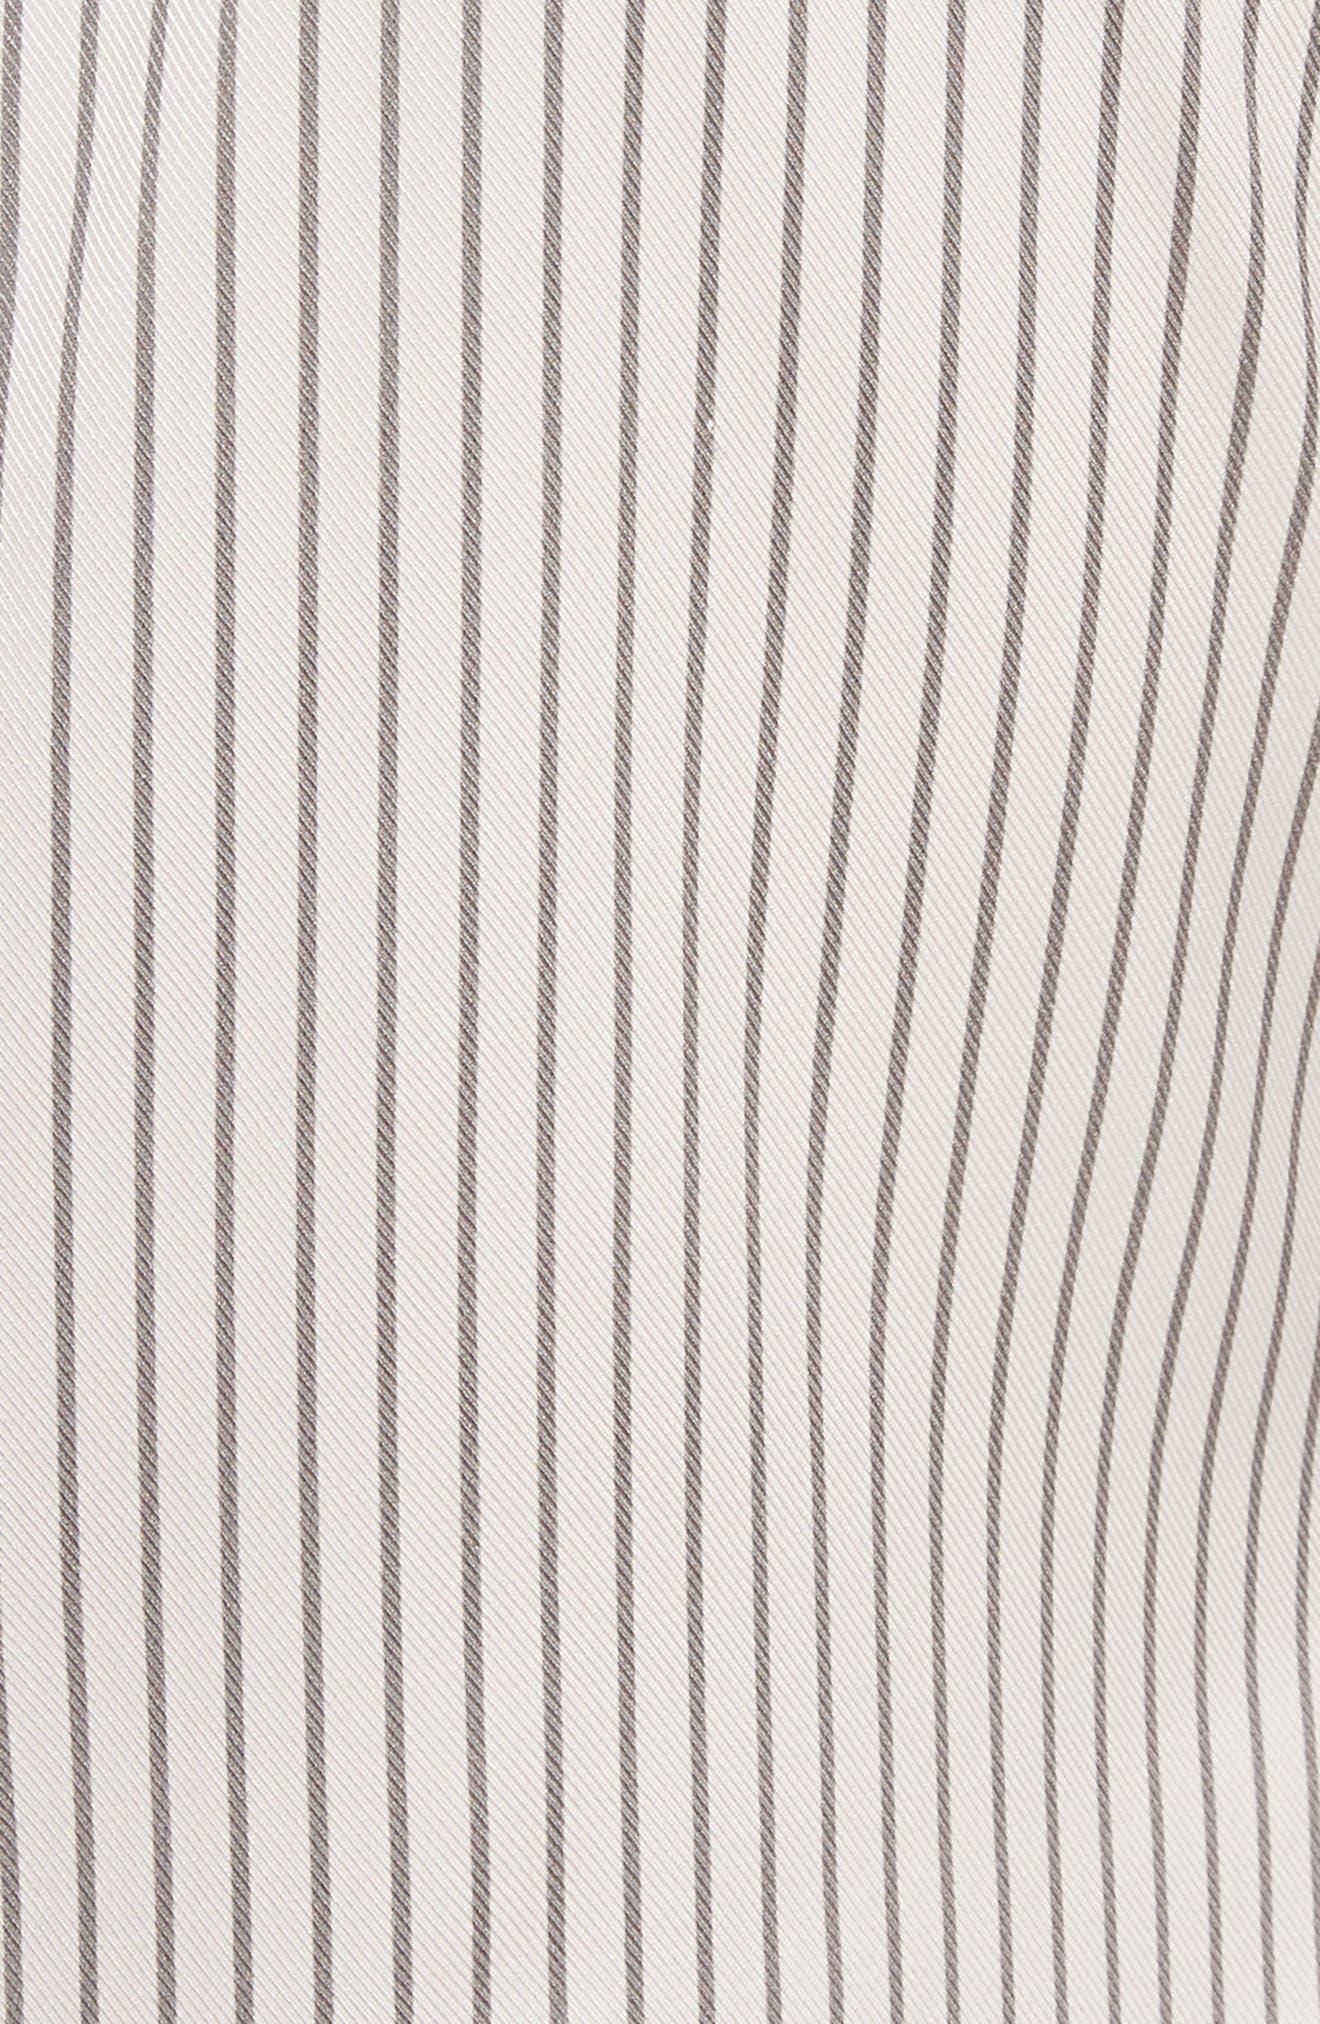 Vertical Stripe Stretch Silk Dress,                             Alternate thumbnail 5, color,                             270